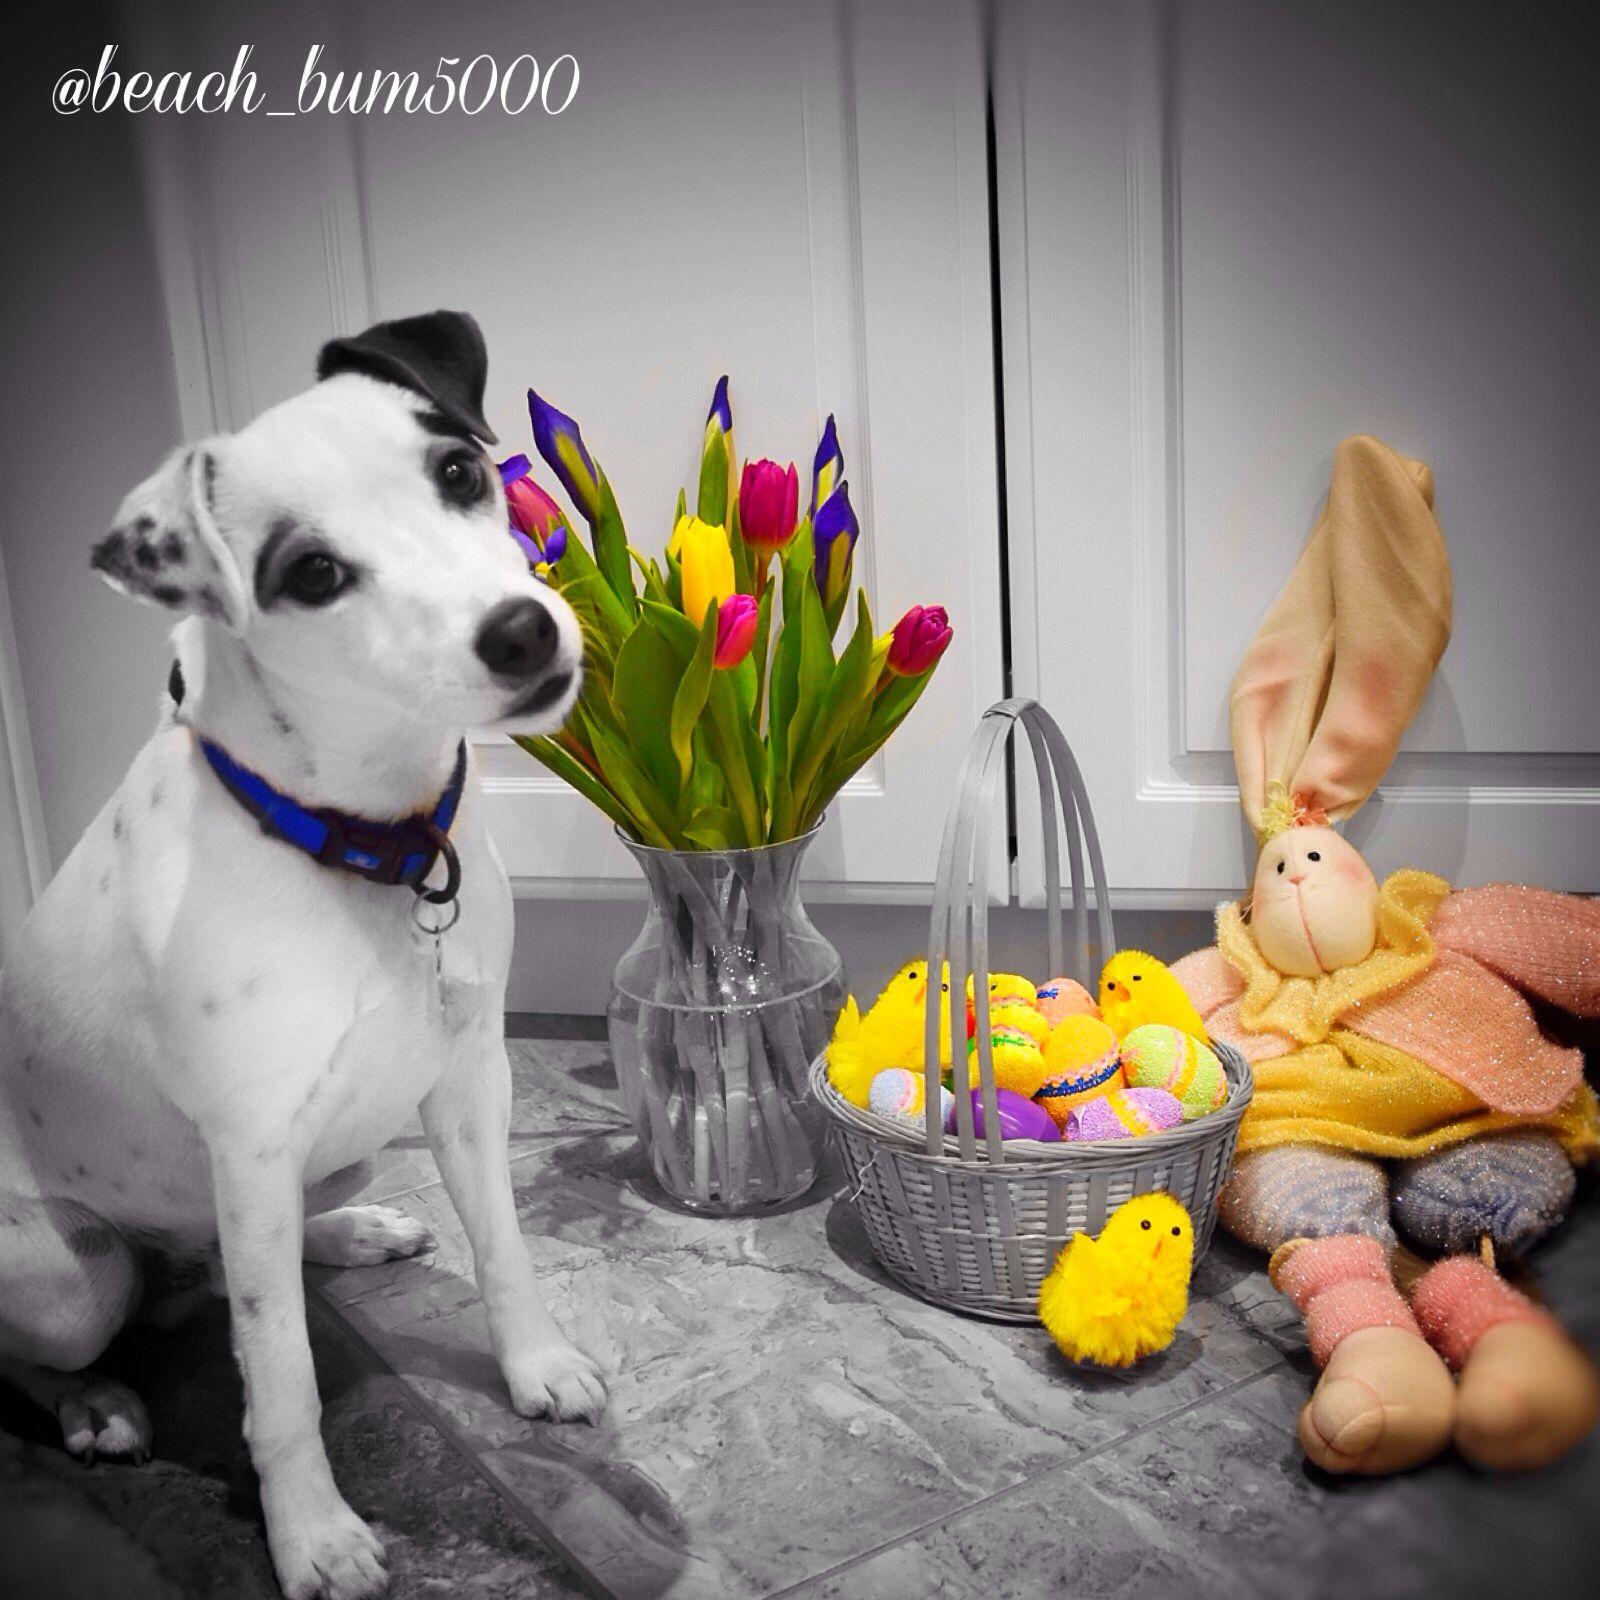 Dewey S Easter Pic Pets Cute Animals Instagram Beach